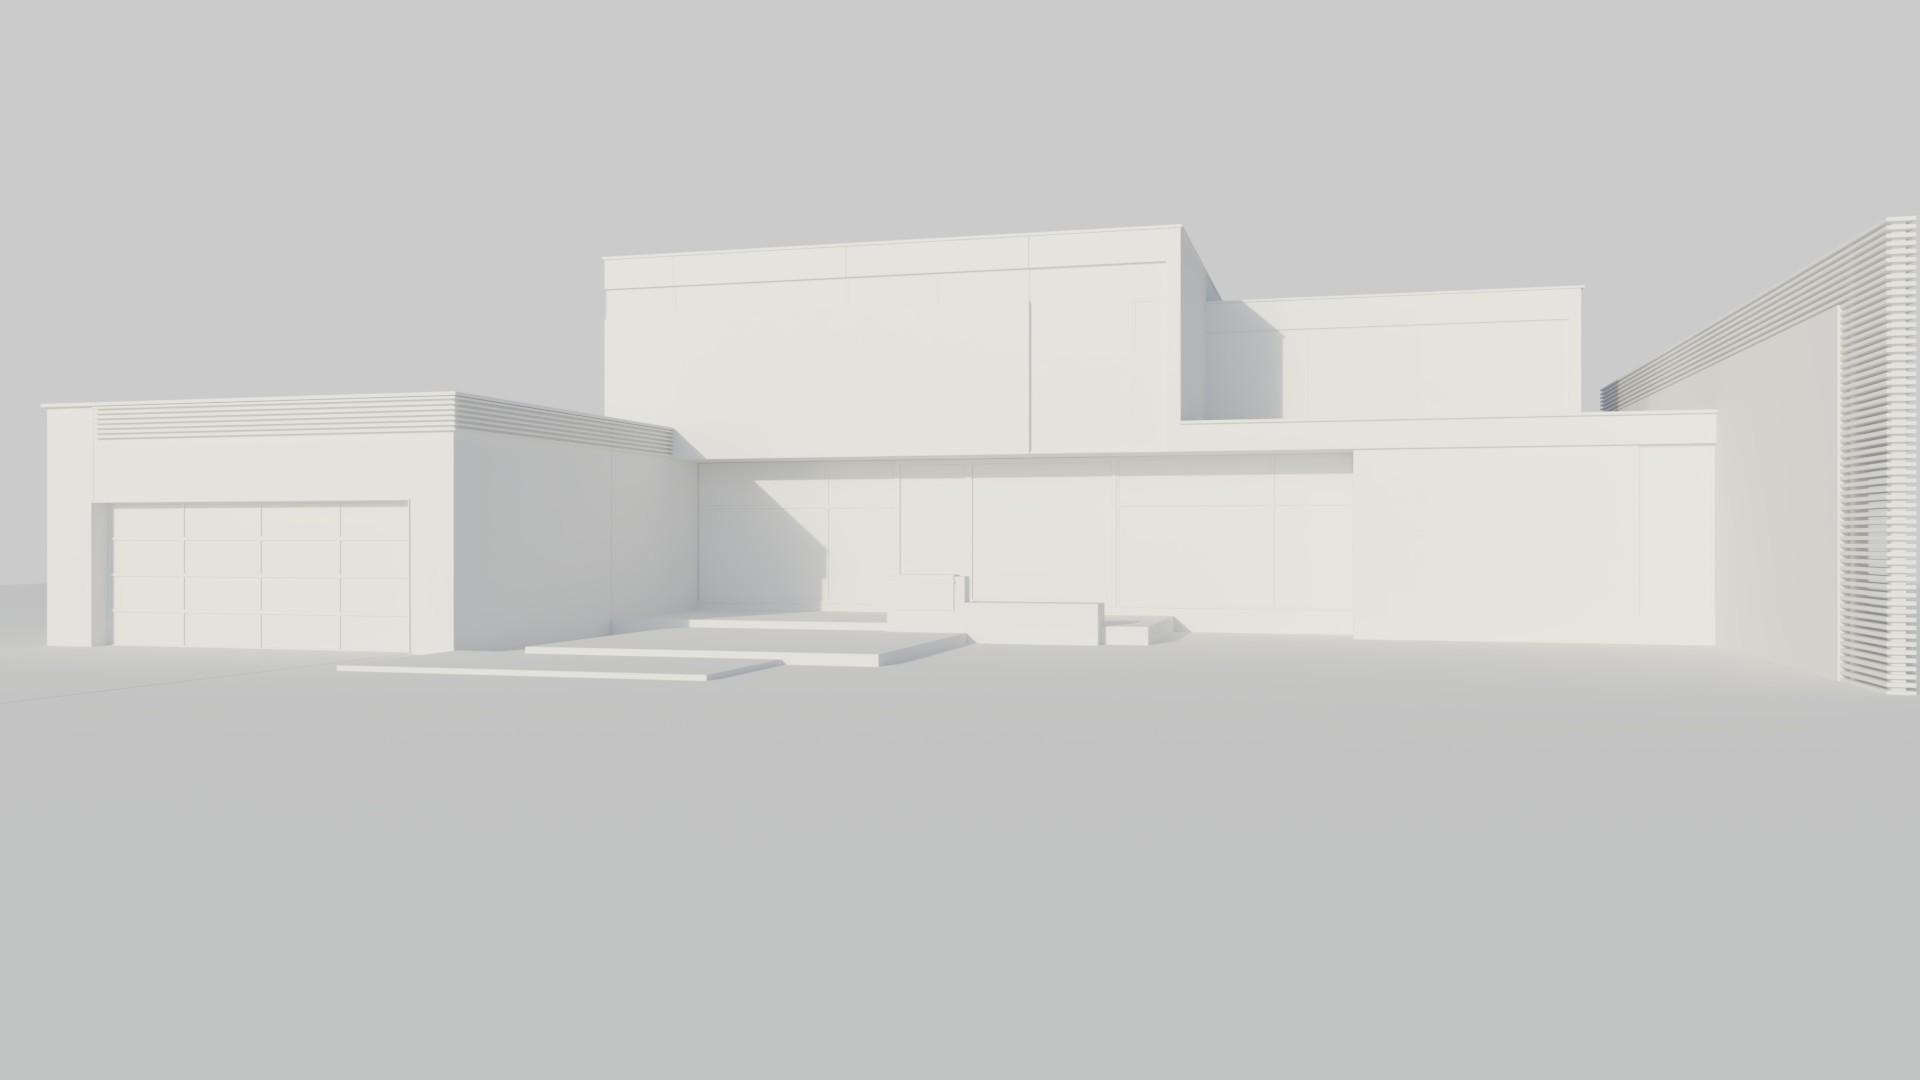 Dev image 1 - Basic Modelling